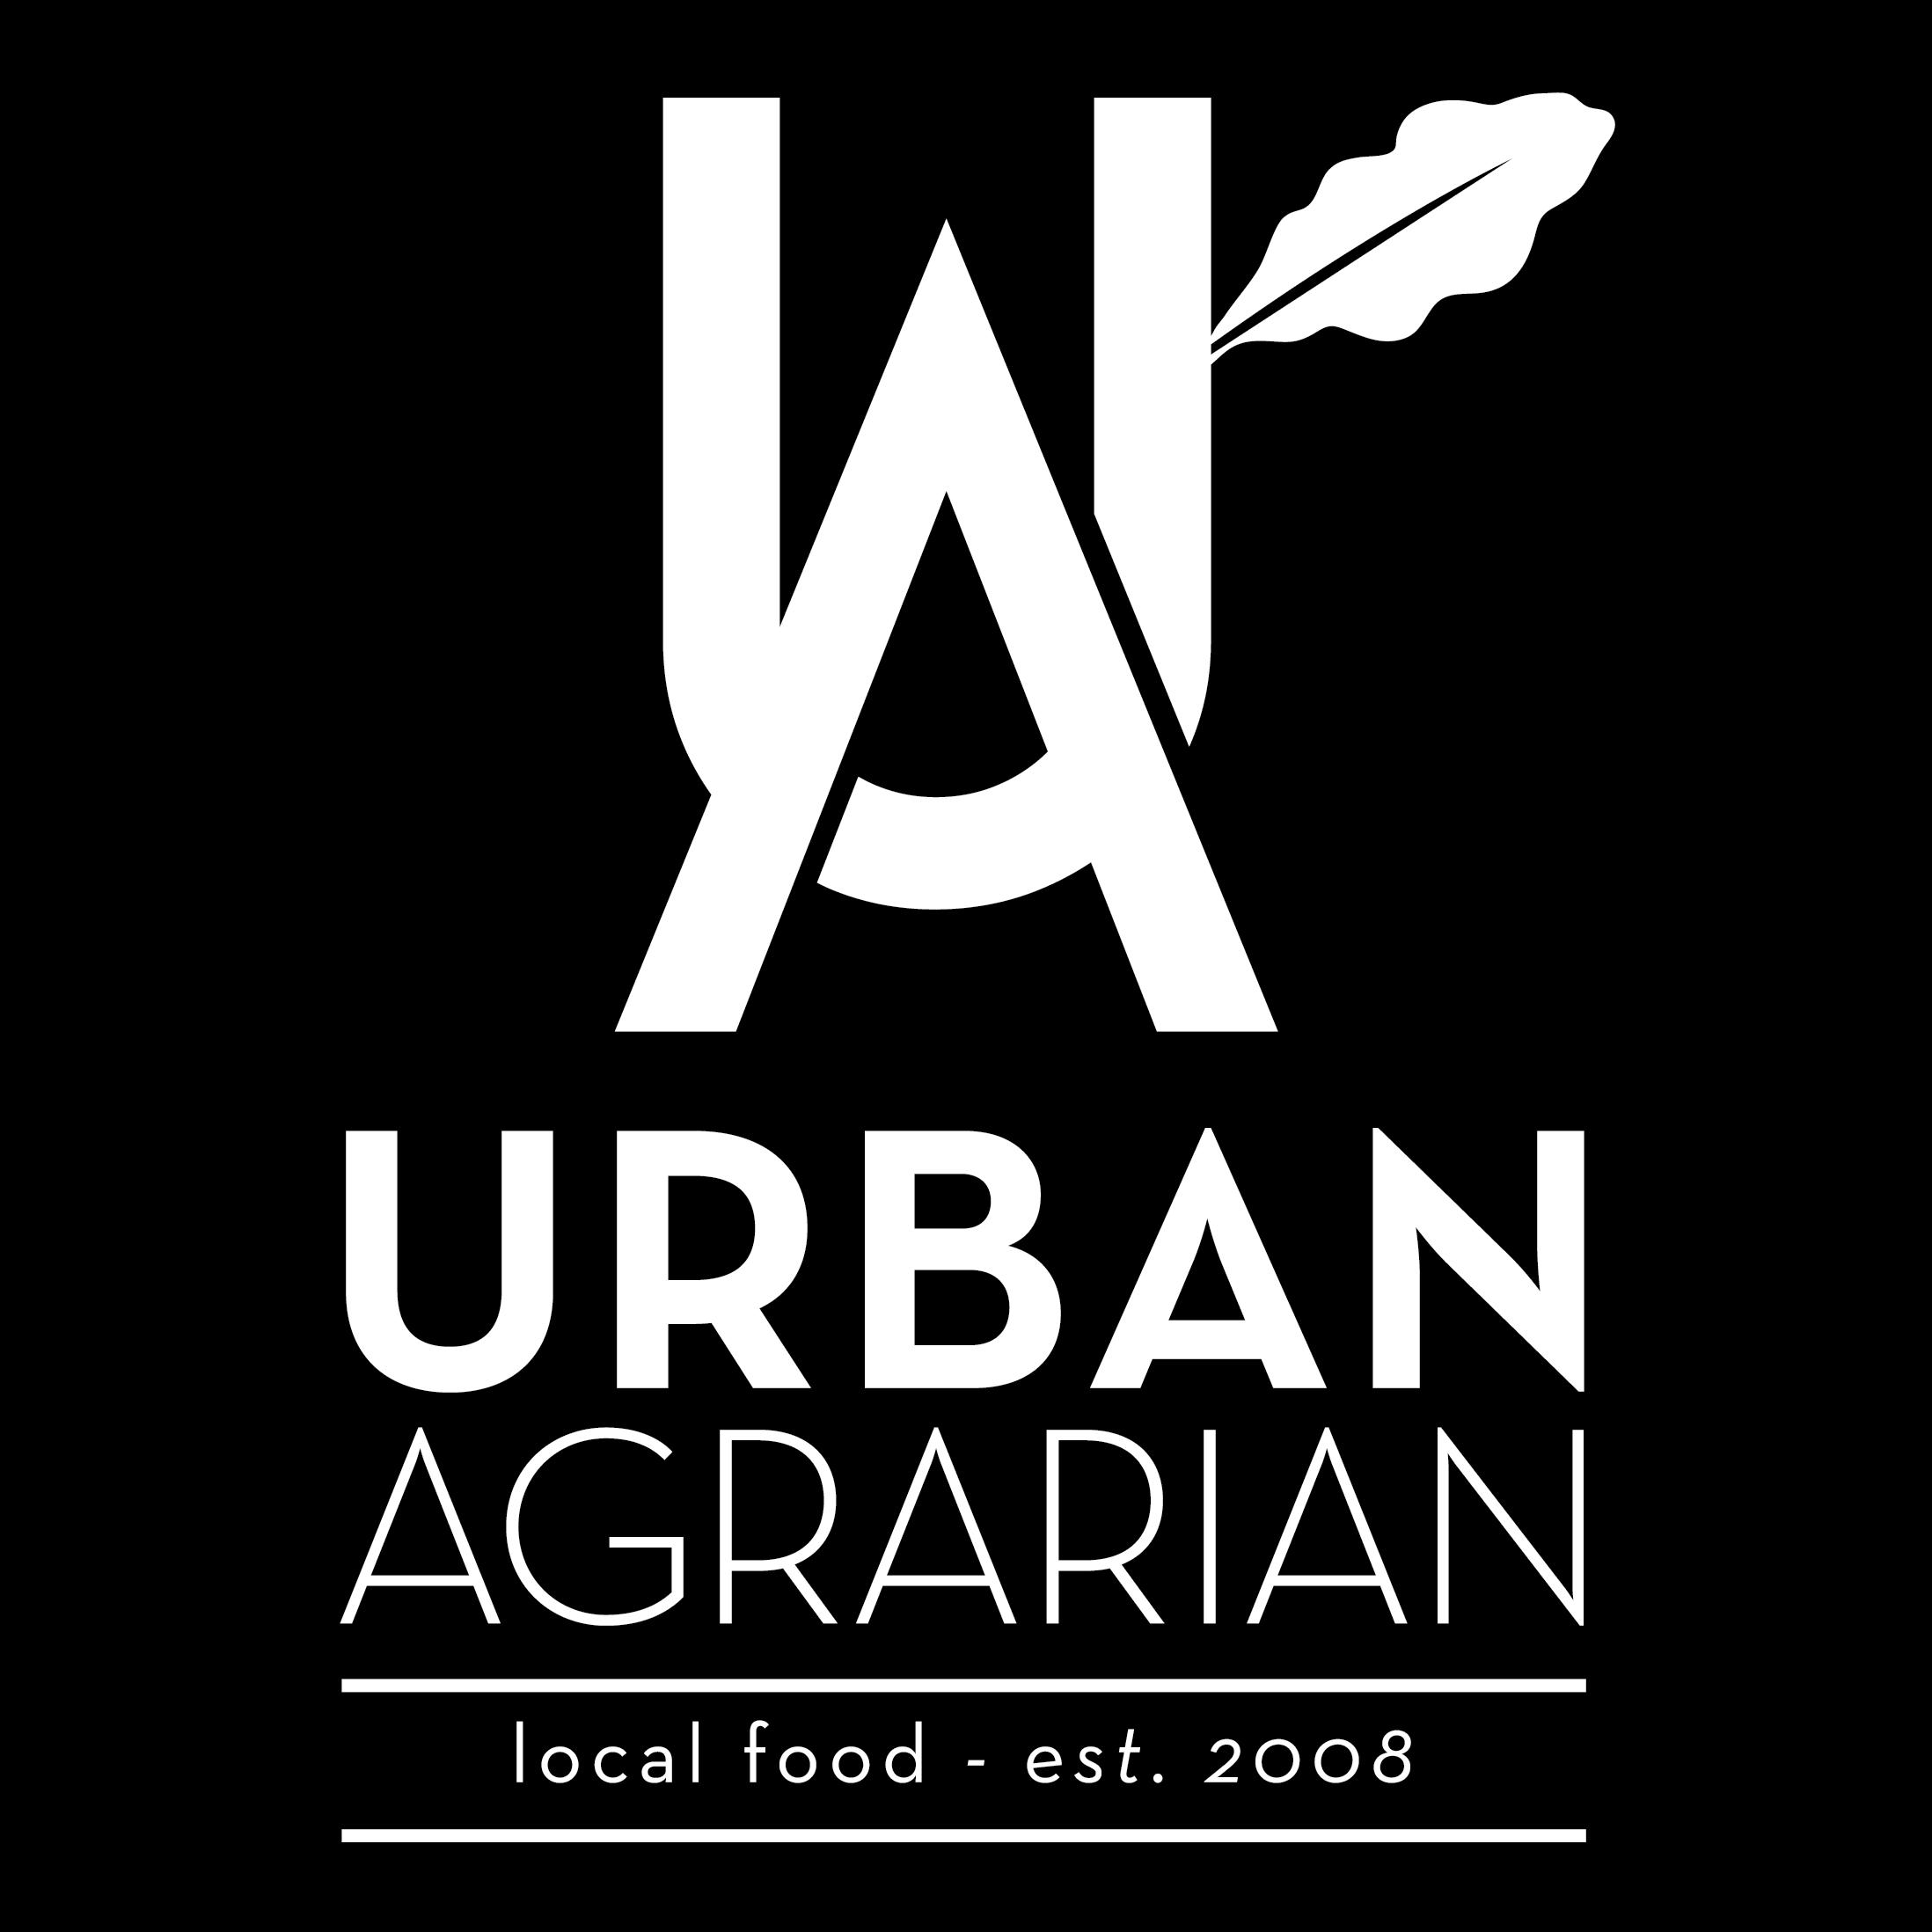 Urban Agrarian